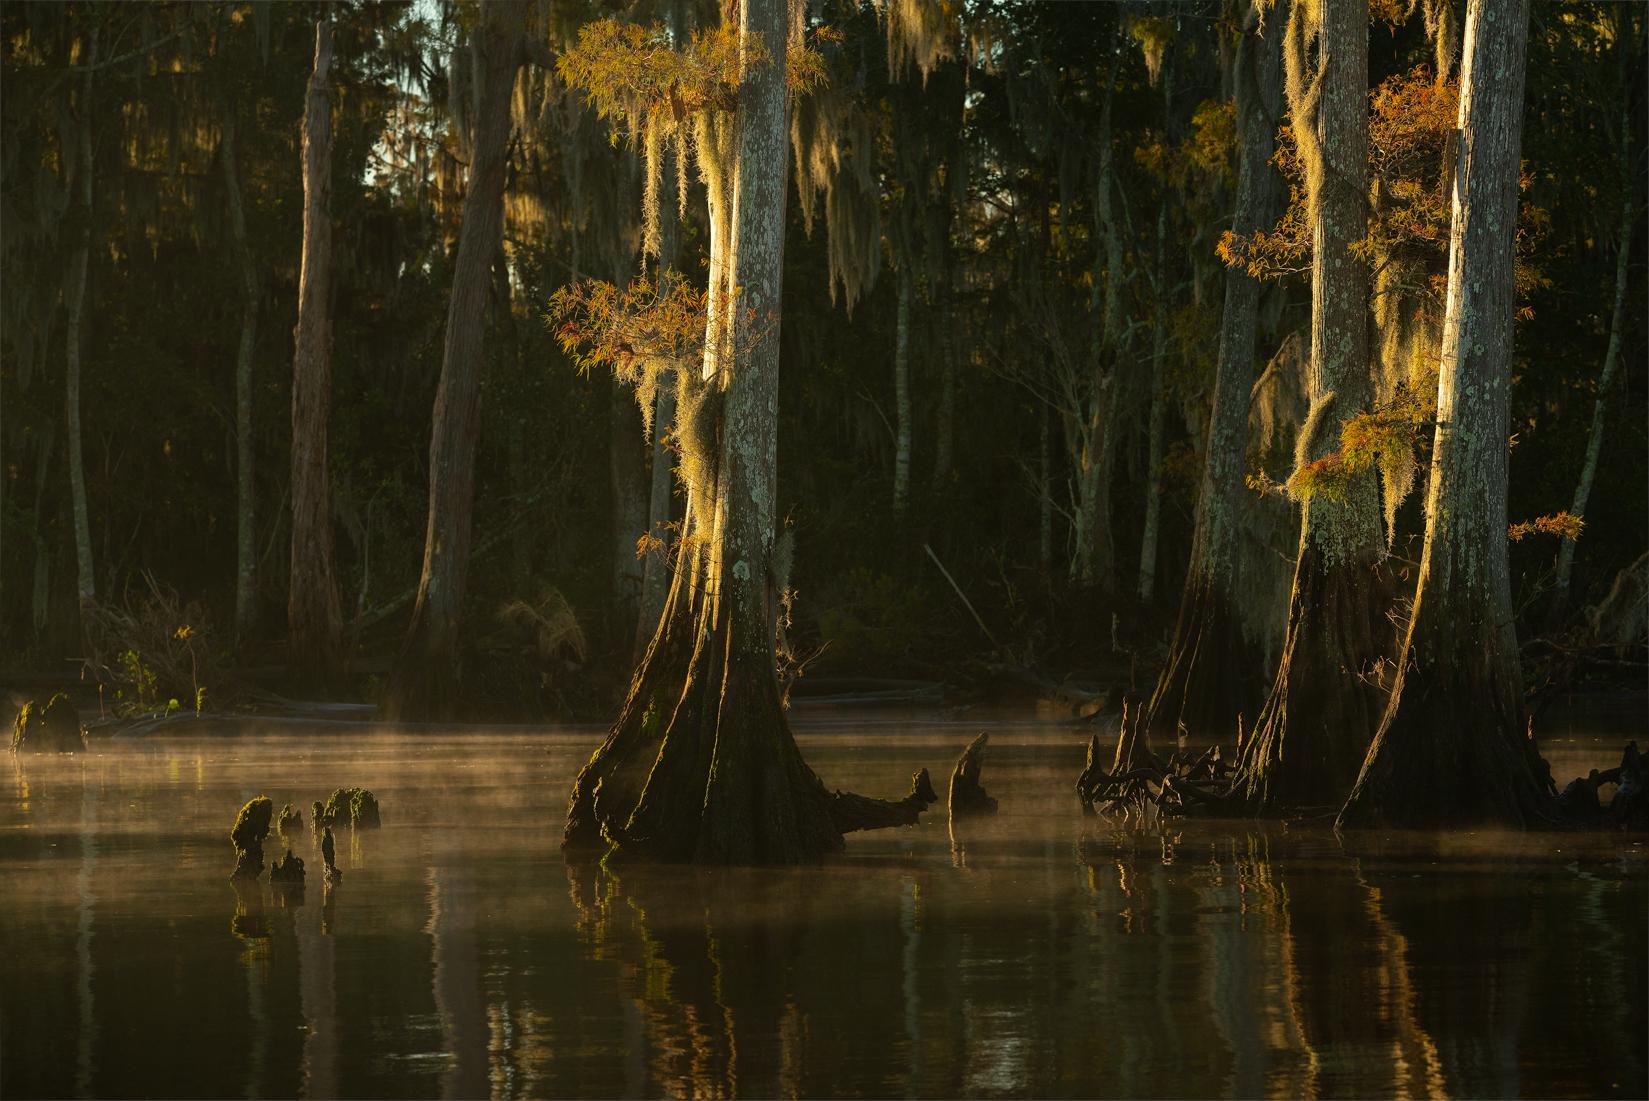 tour, swamp tour, kayak tour, kayak swamp tour, swamp photo tour, swamp photo workshop, new orleans swamp tour, new orleans kayak tour